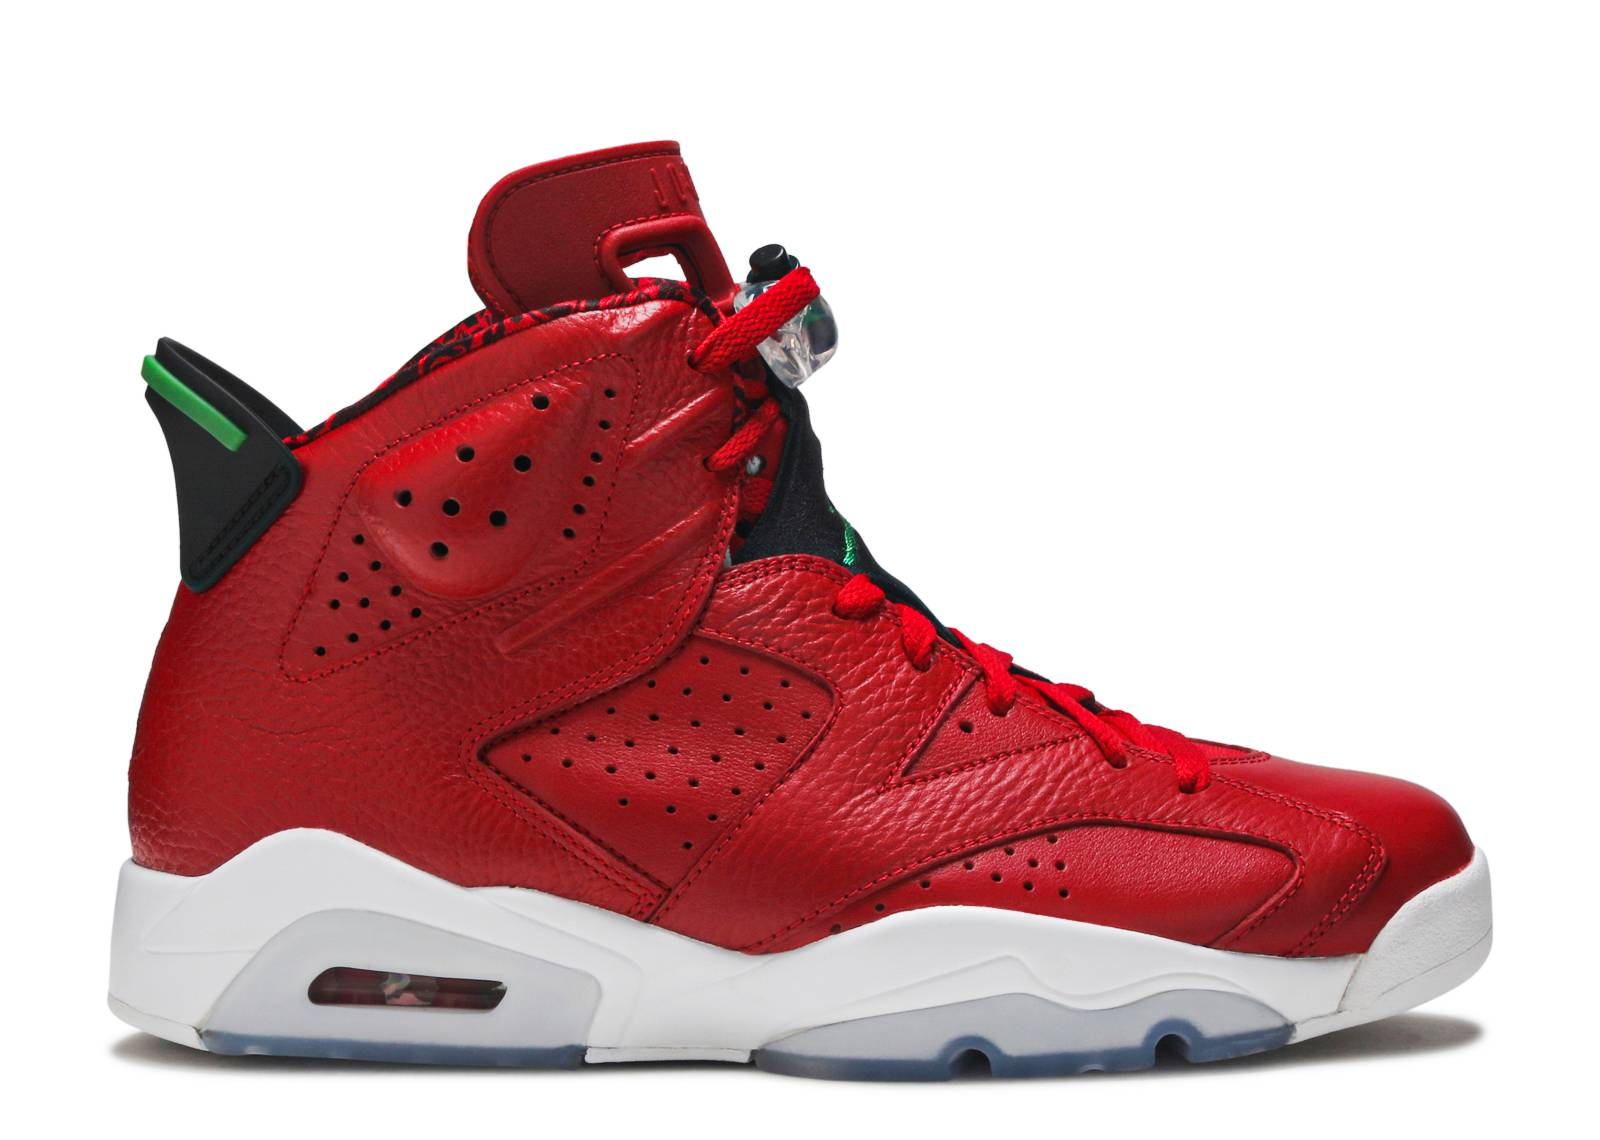 Jordan 6 Spizike